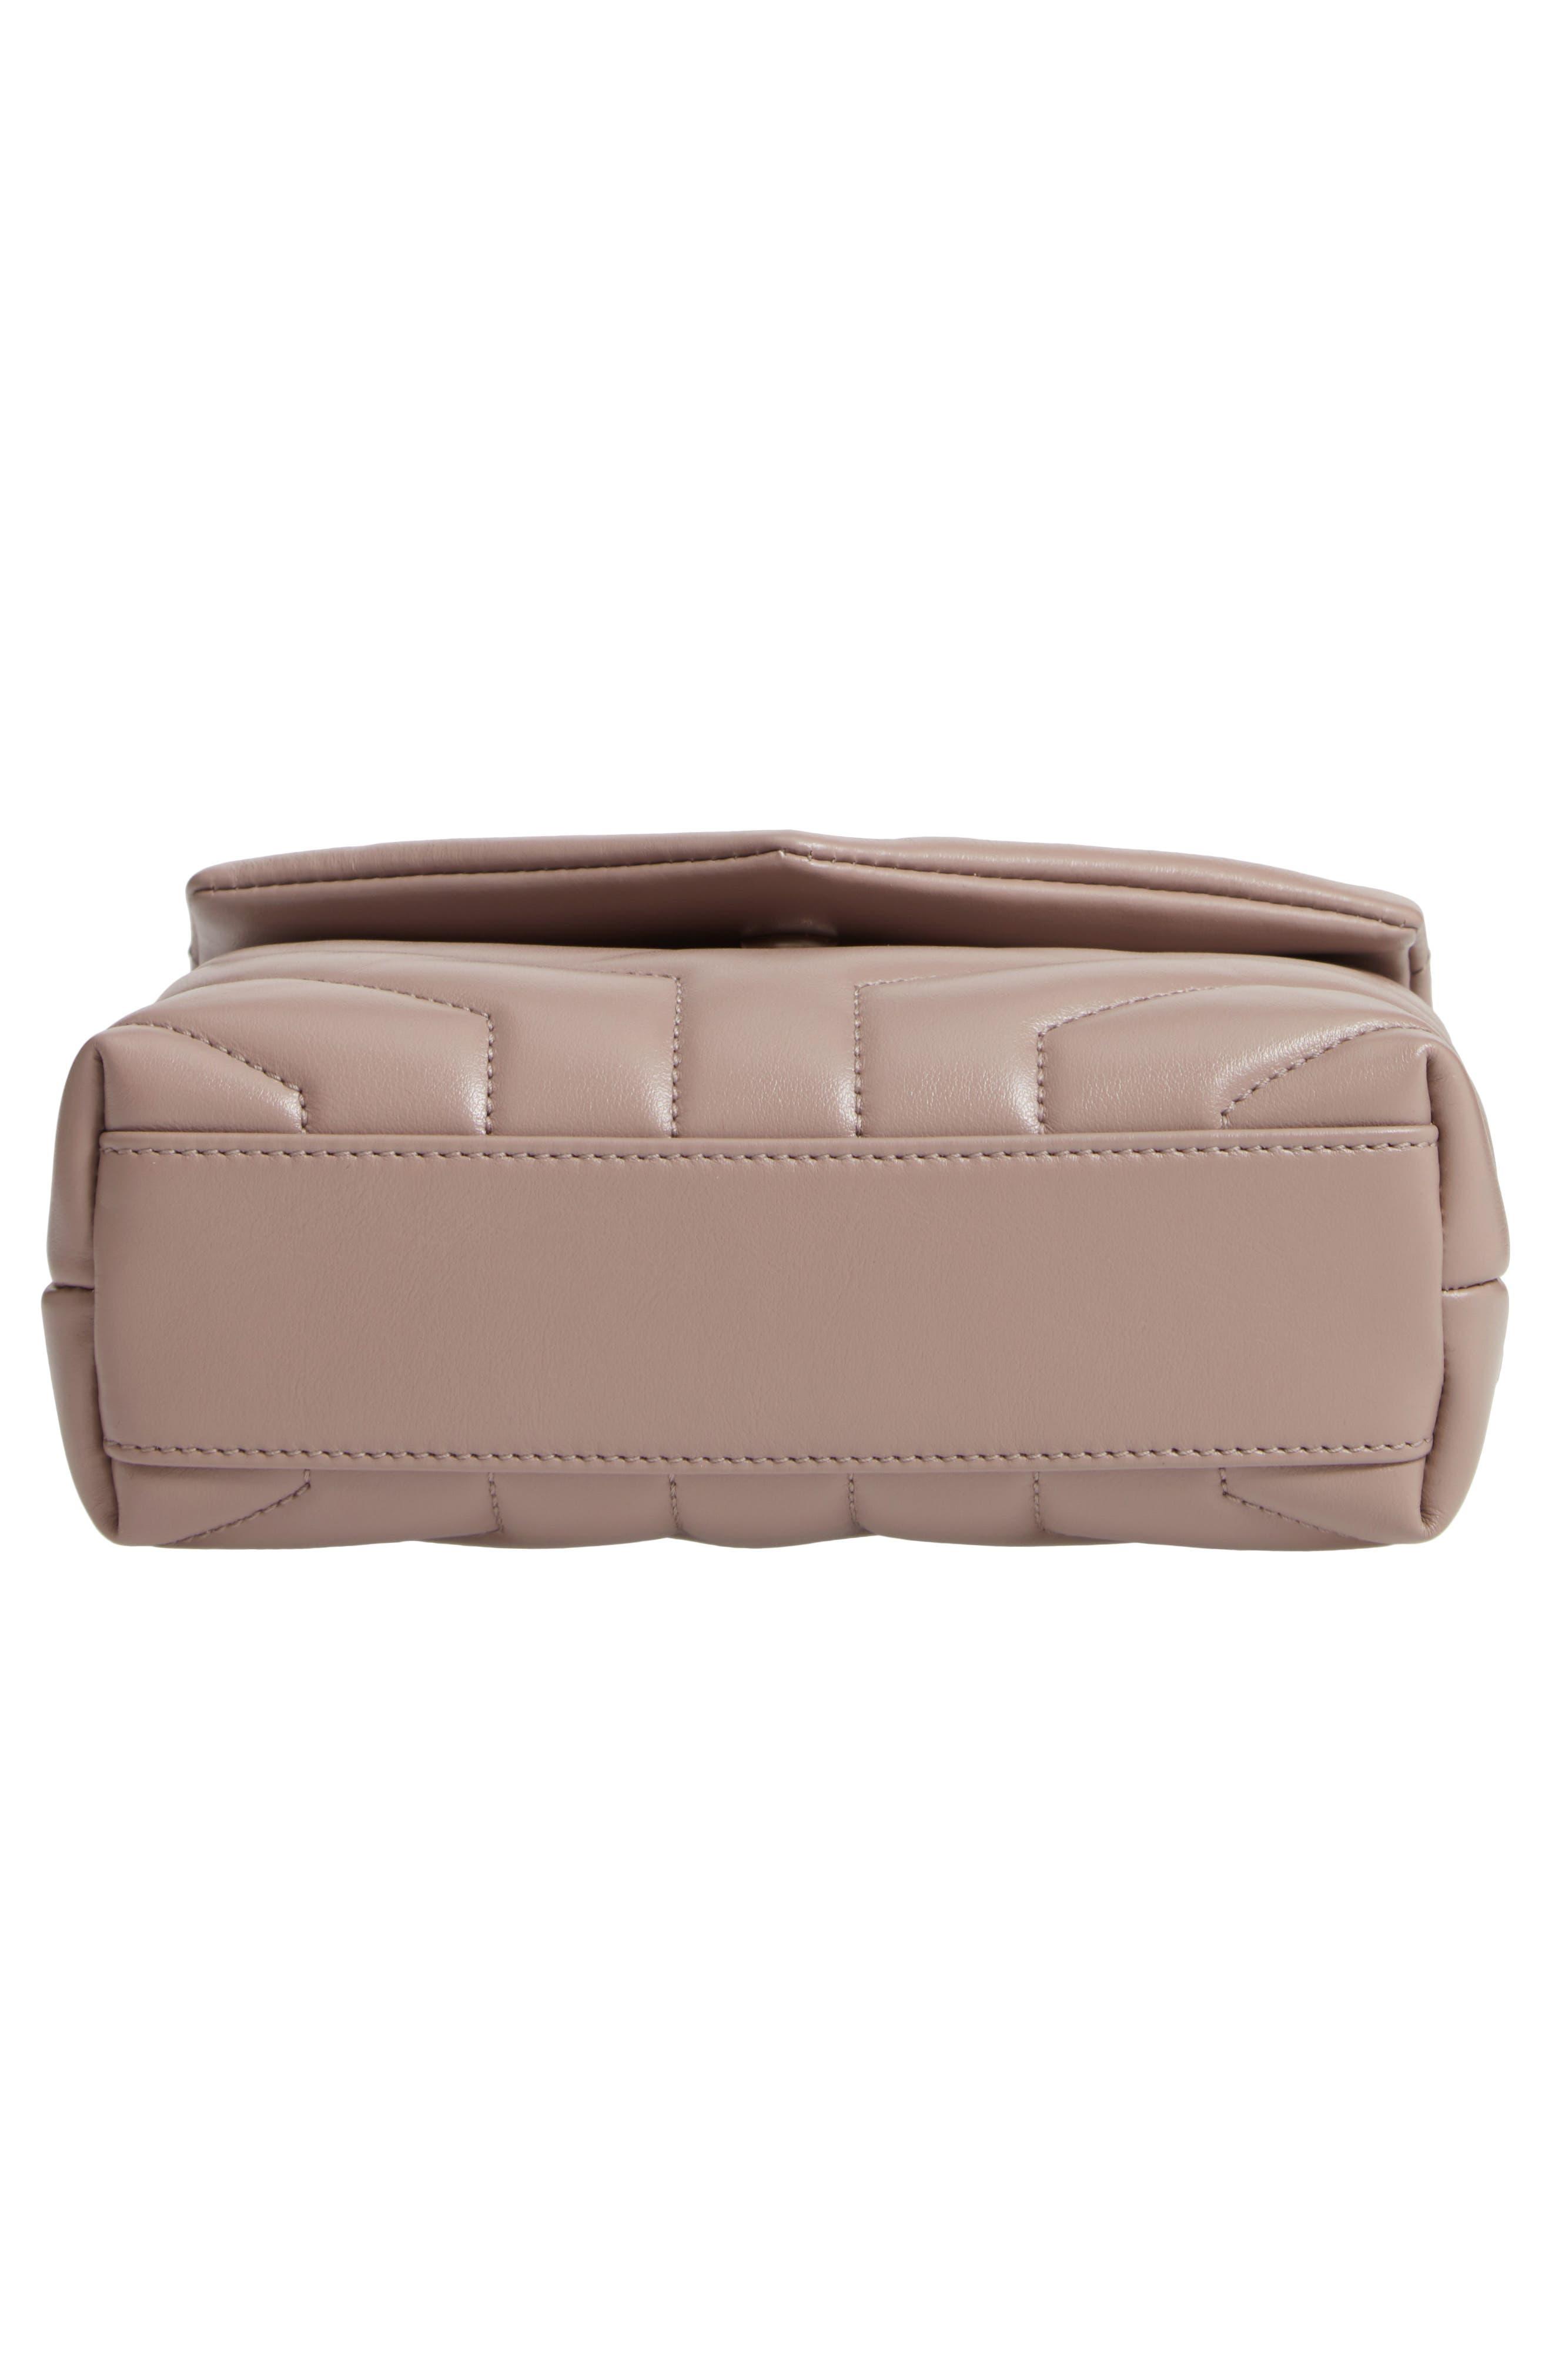 SAINT LAURENT, Toy Loulou Calfskin Leather Crossbody Bag, Alternate thumbnail 6, color, MINK